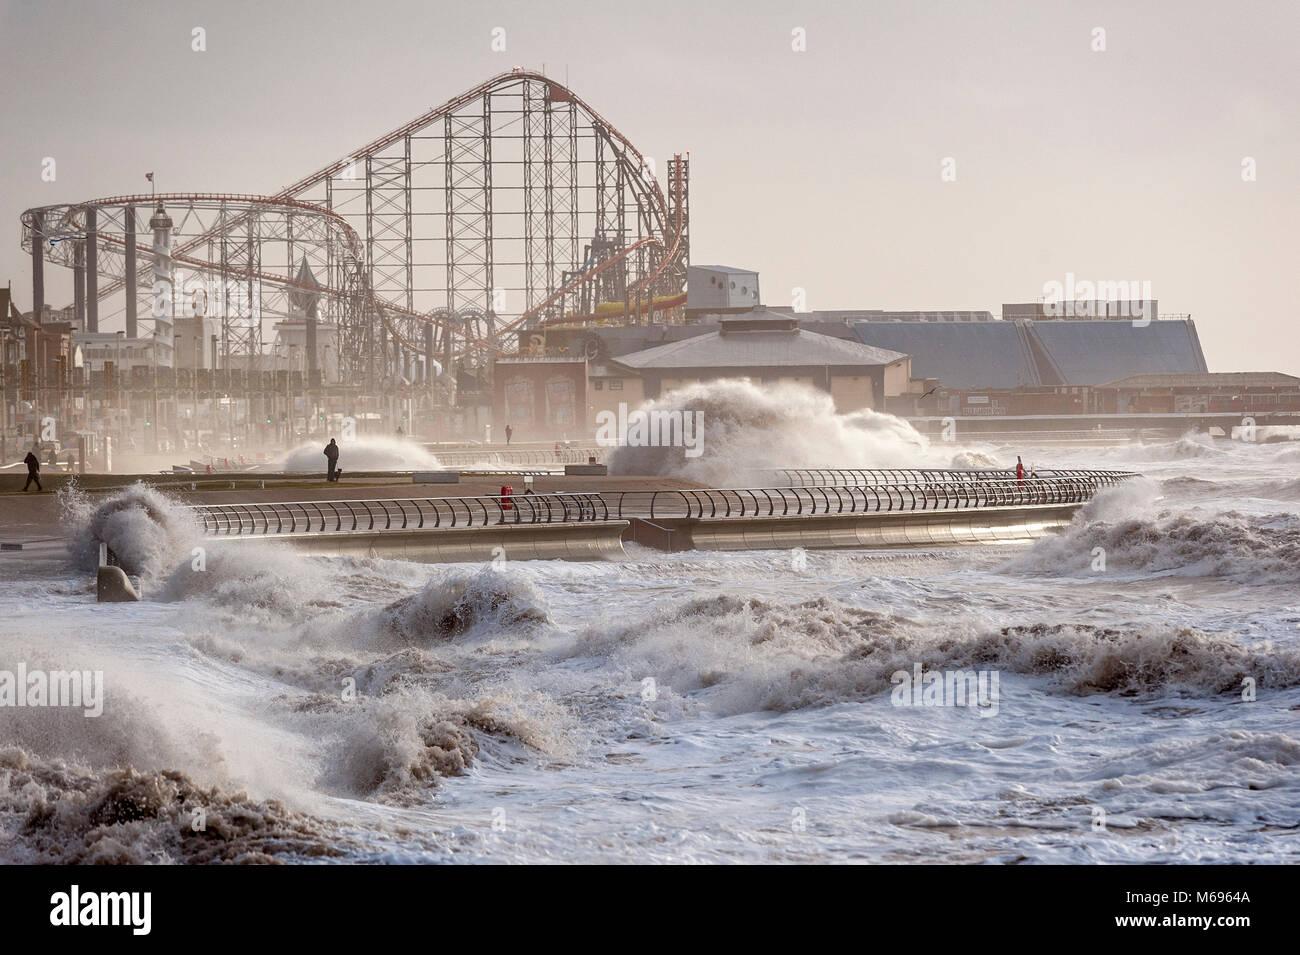 Alta mar en la zona de North Shore de Blackpool Lancashire uk Casa de la famosa Pleasure Beach Imagen De Stock